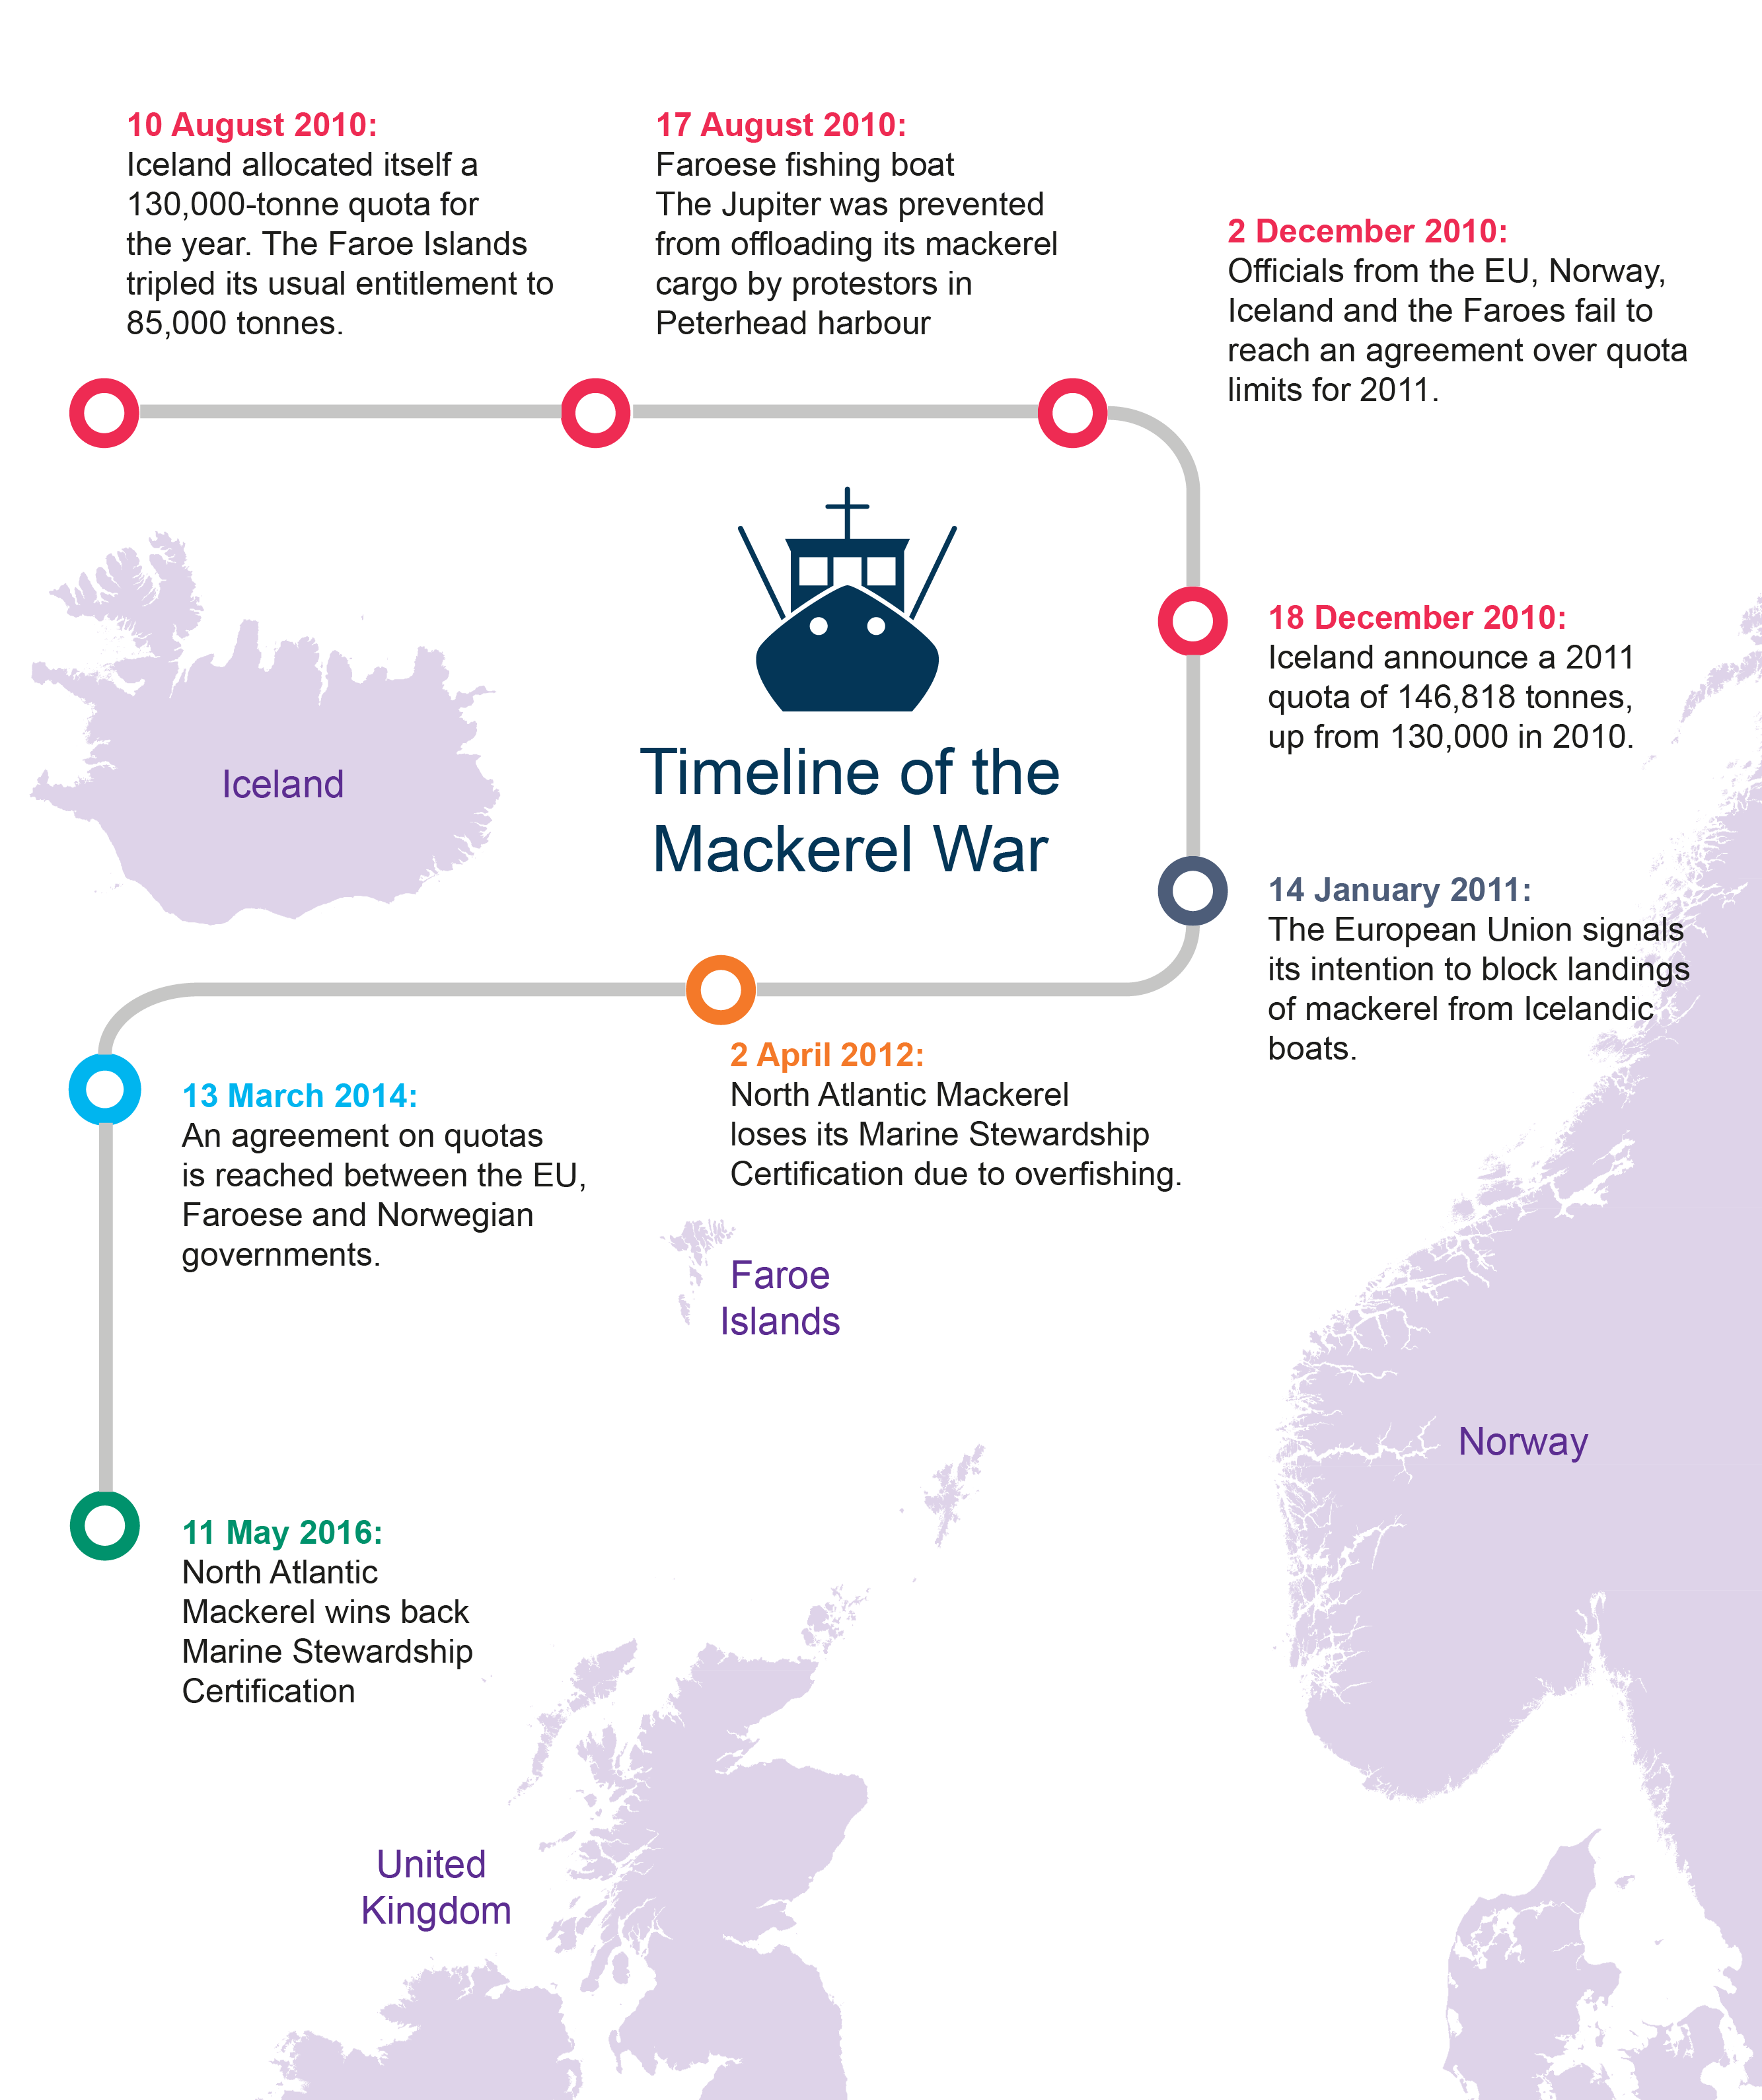 Timeline of the Mackerel War